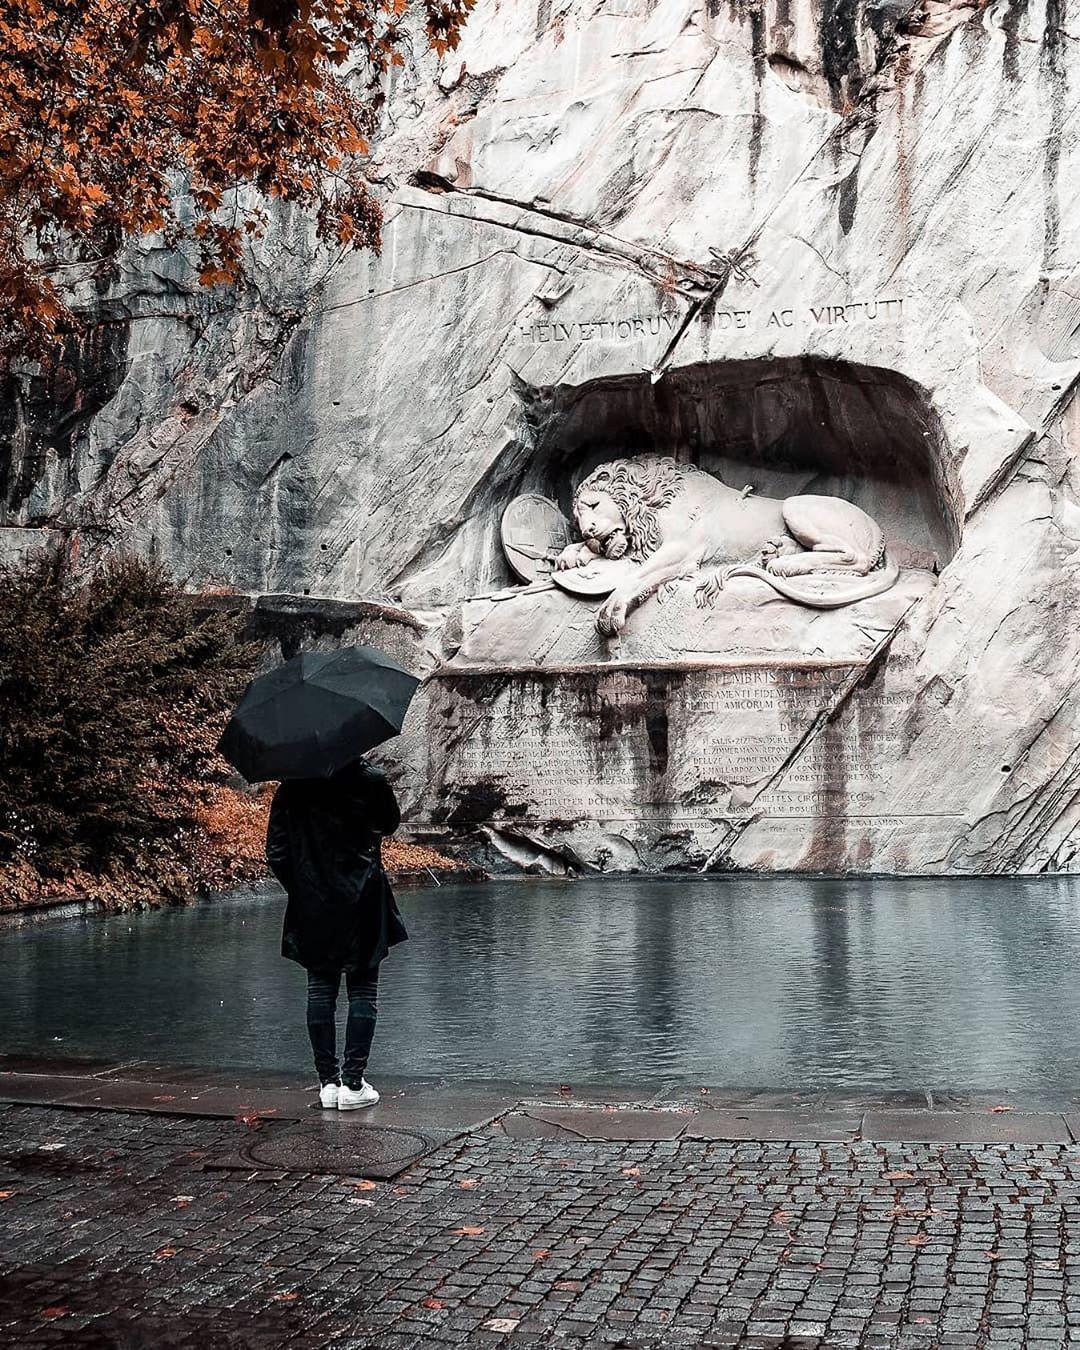 Löwendenkmal Luzern, Lion Monument, Thụy Sỹ